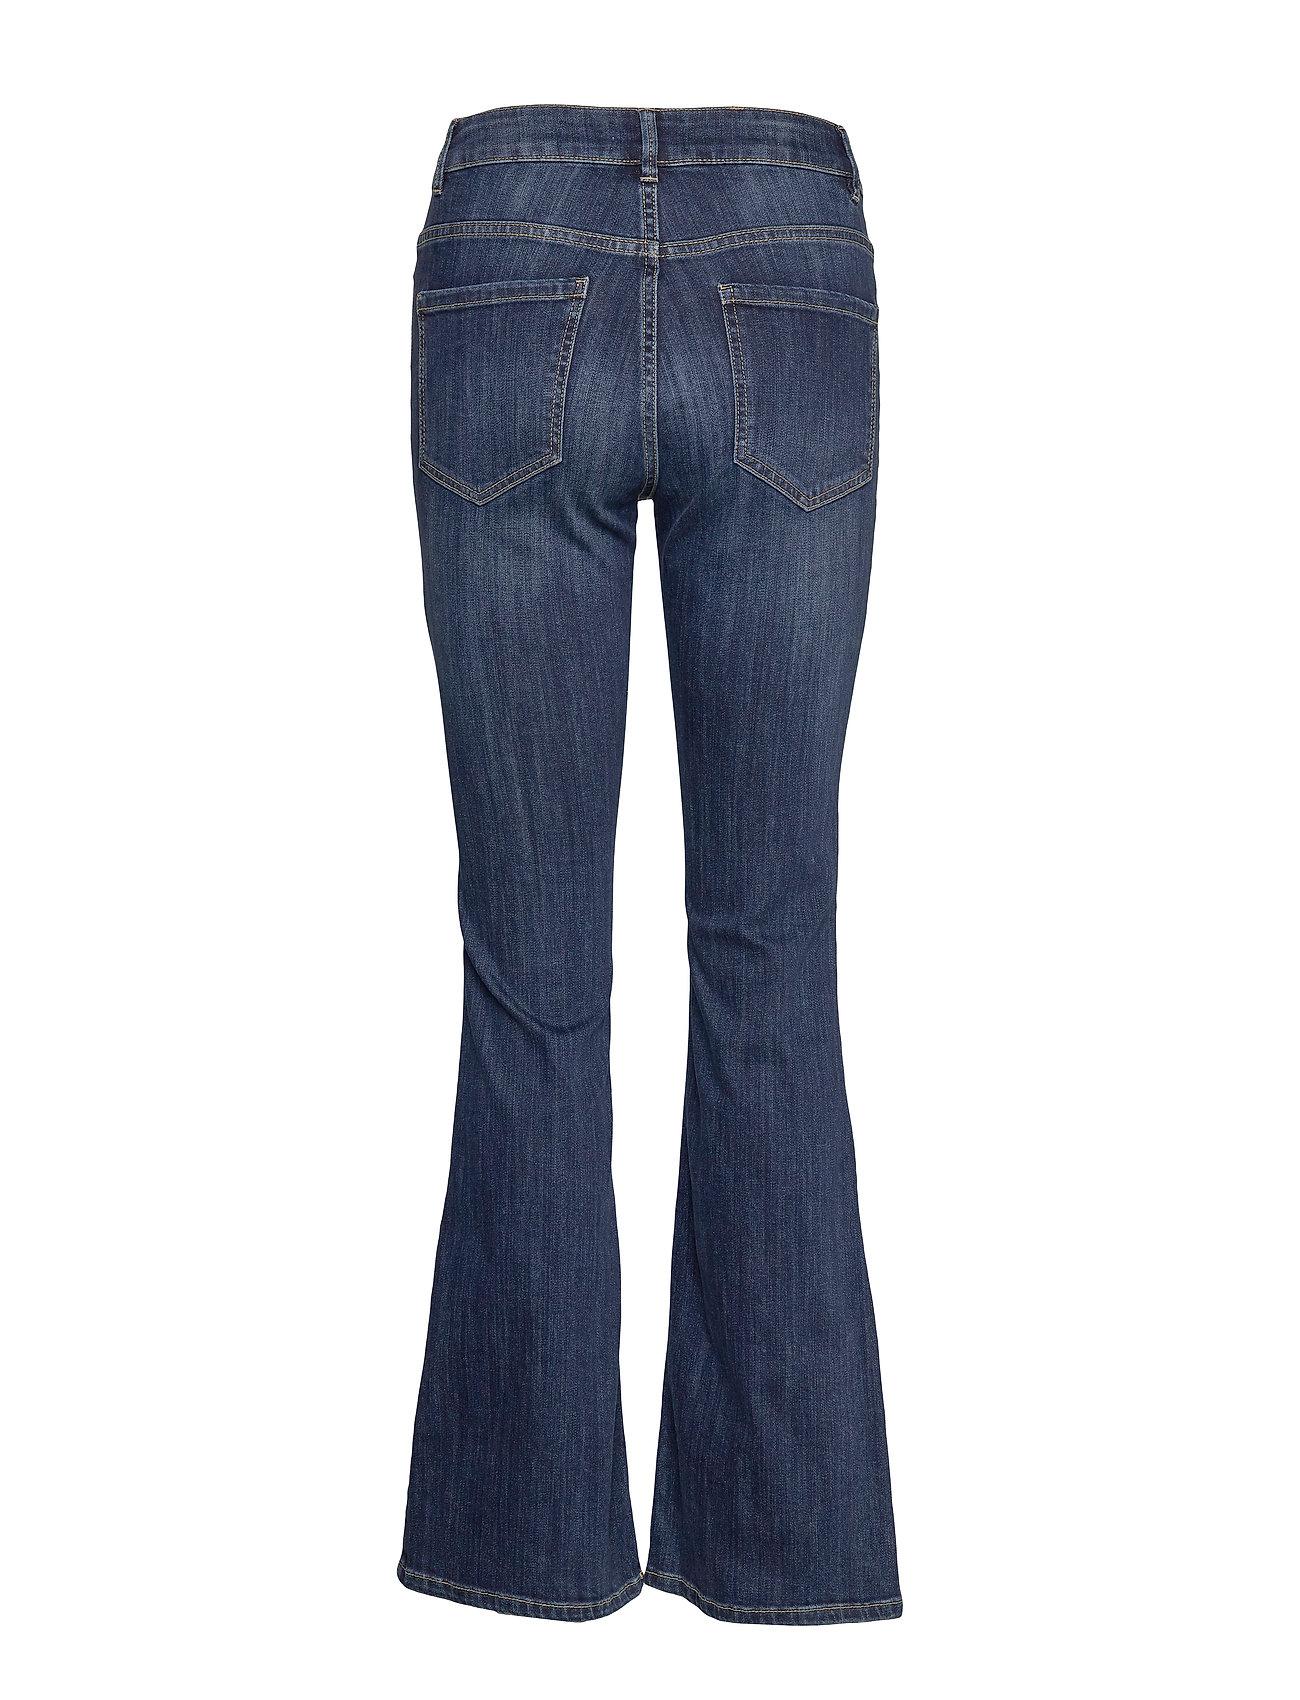 Lindex Trouser Denim Karen Boot - Jeans